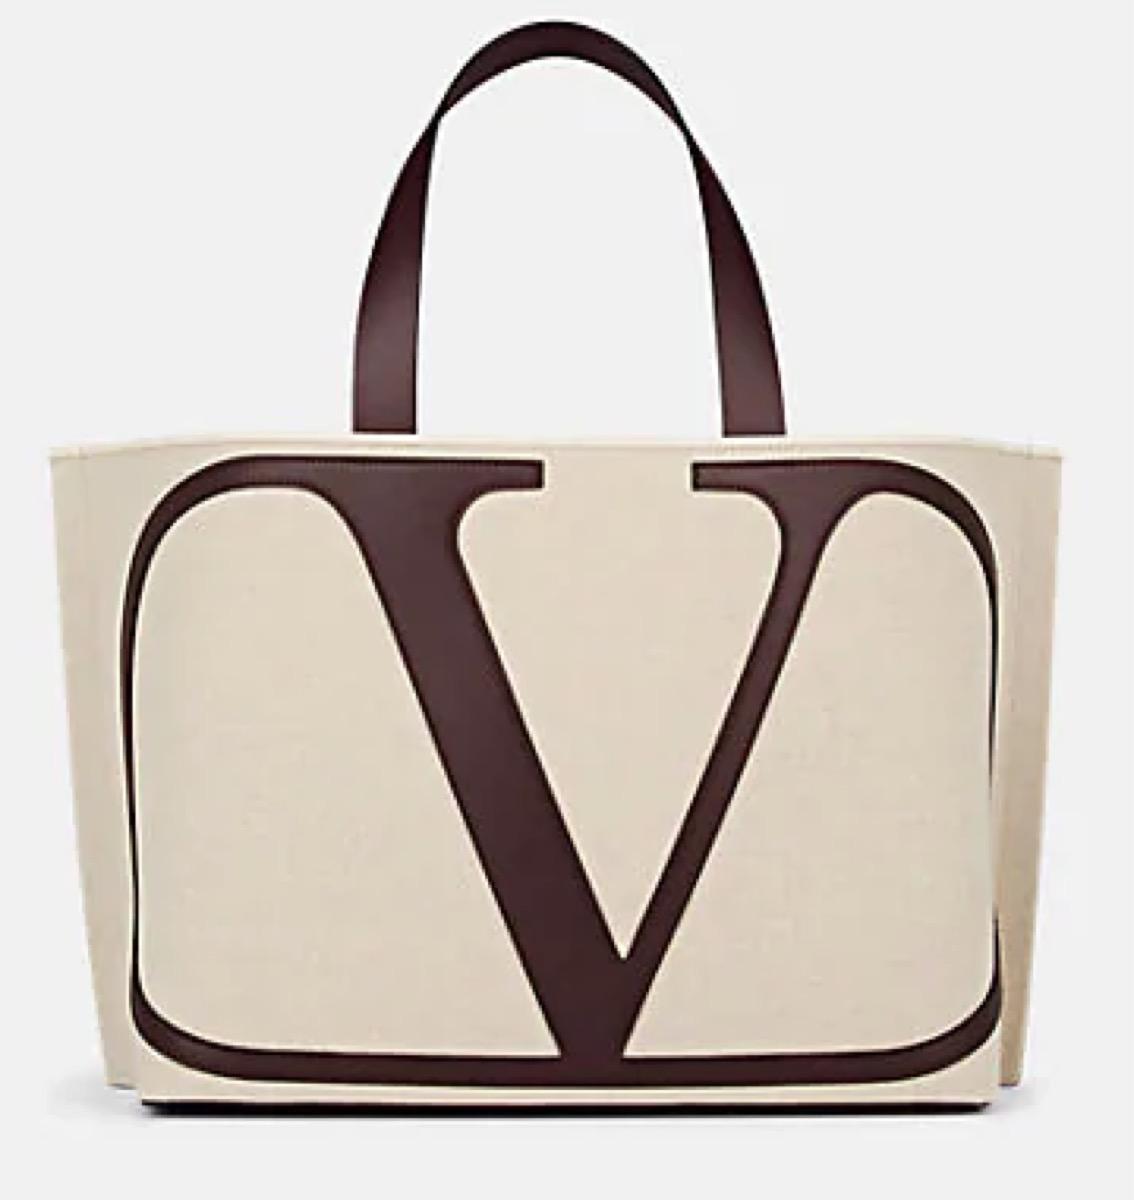 white tote with big V logo, luxury beach bags